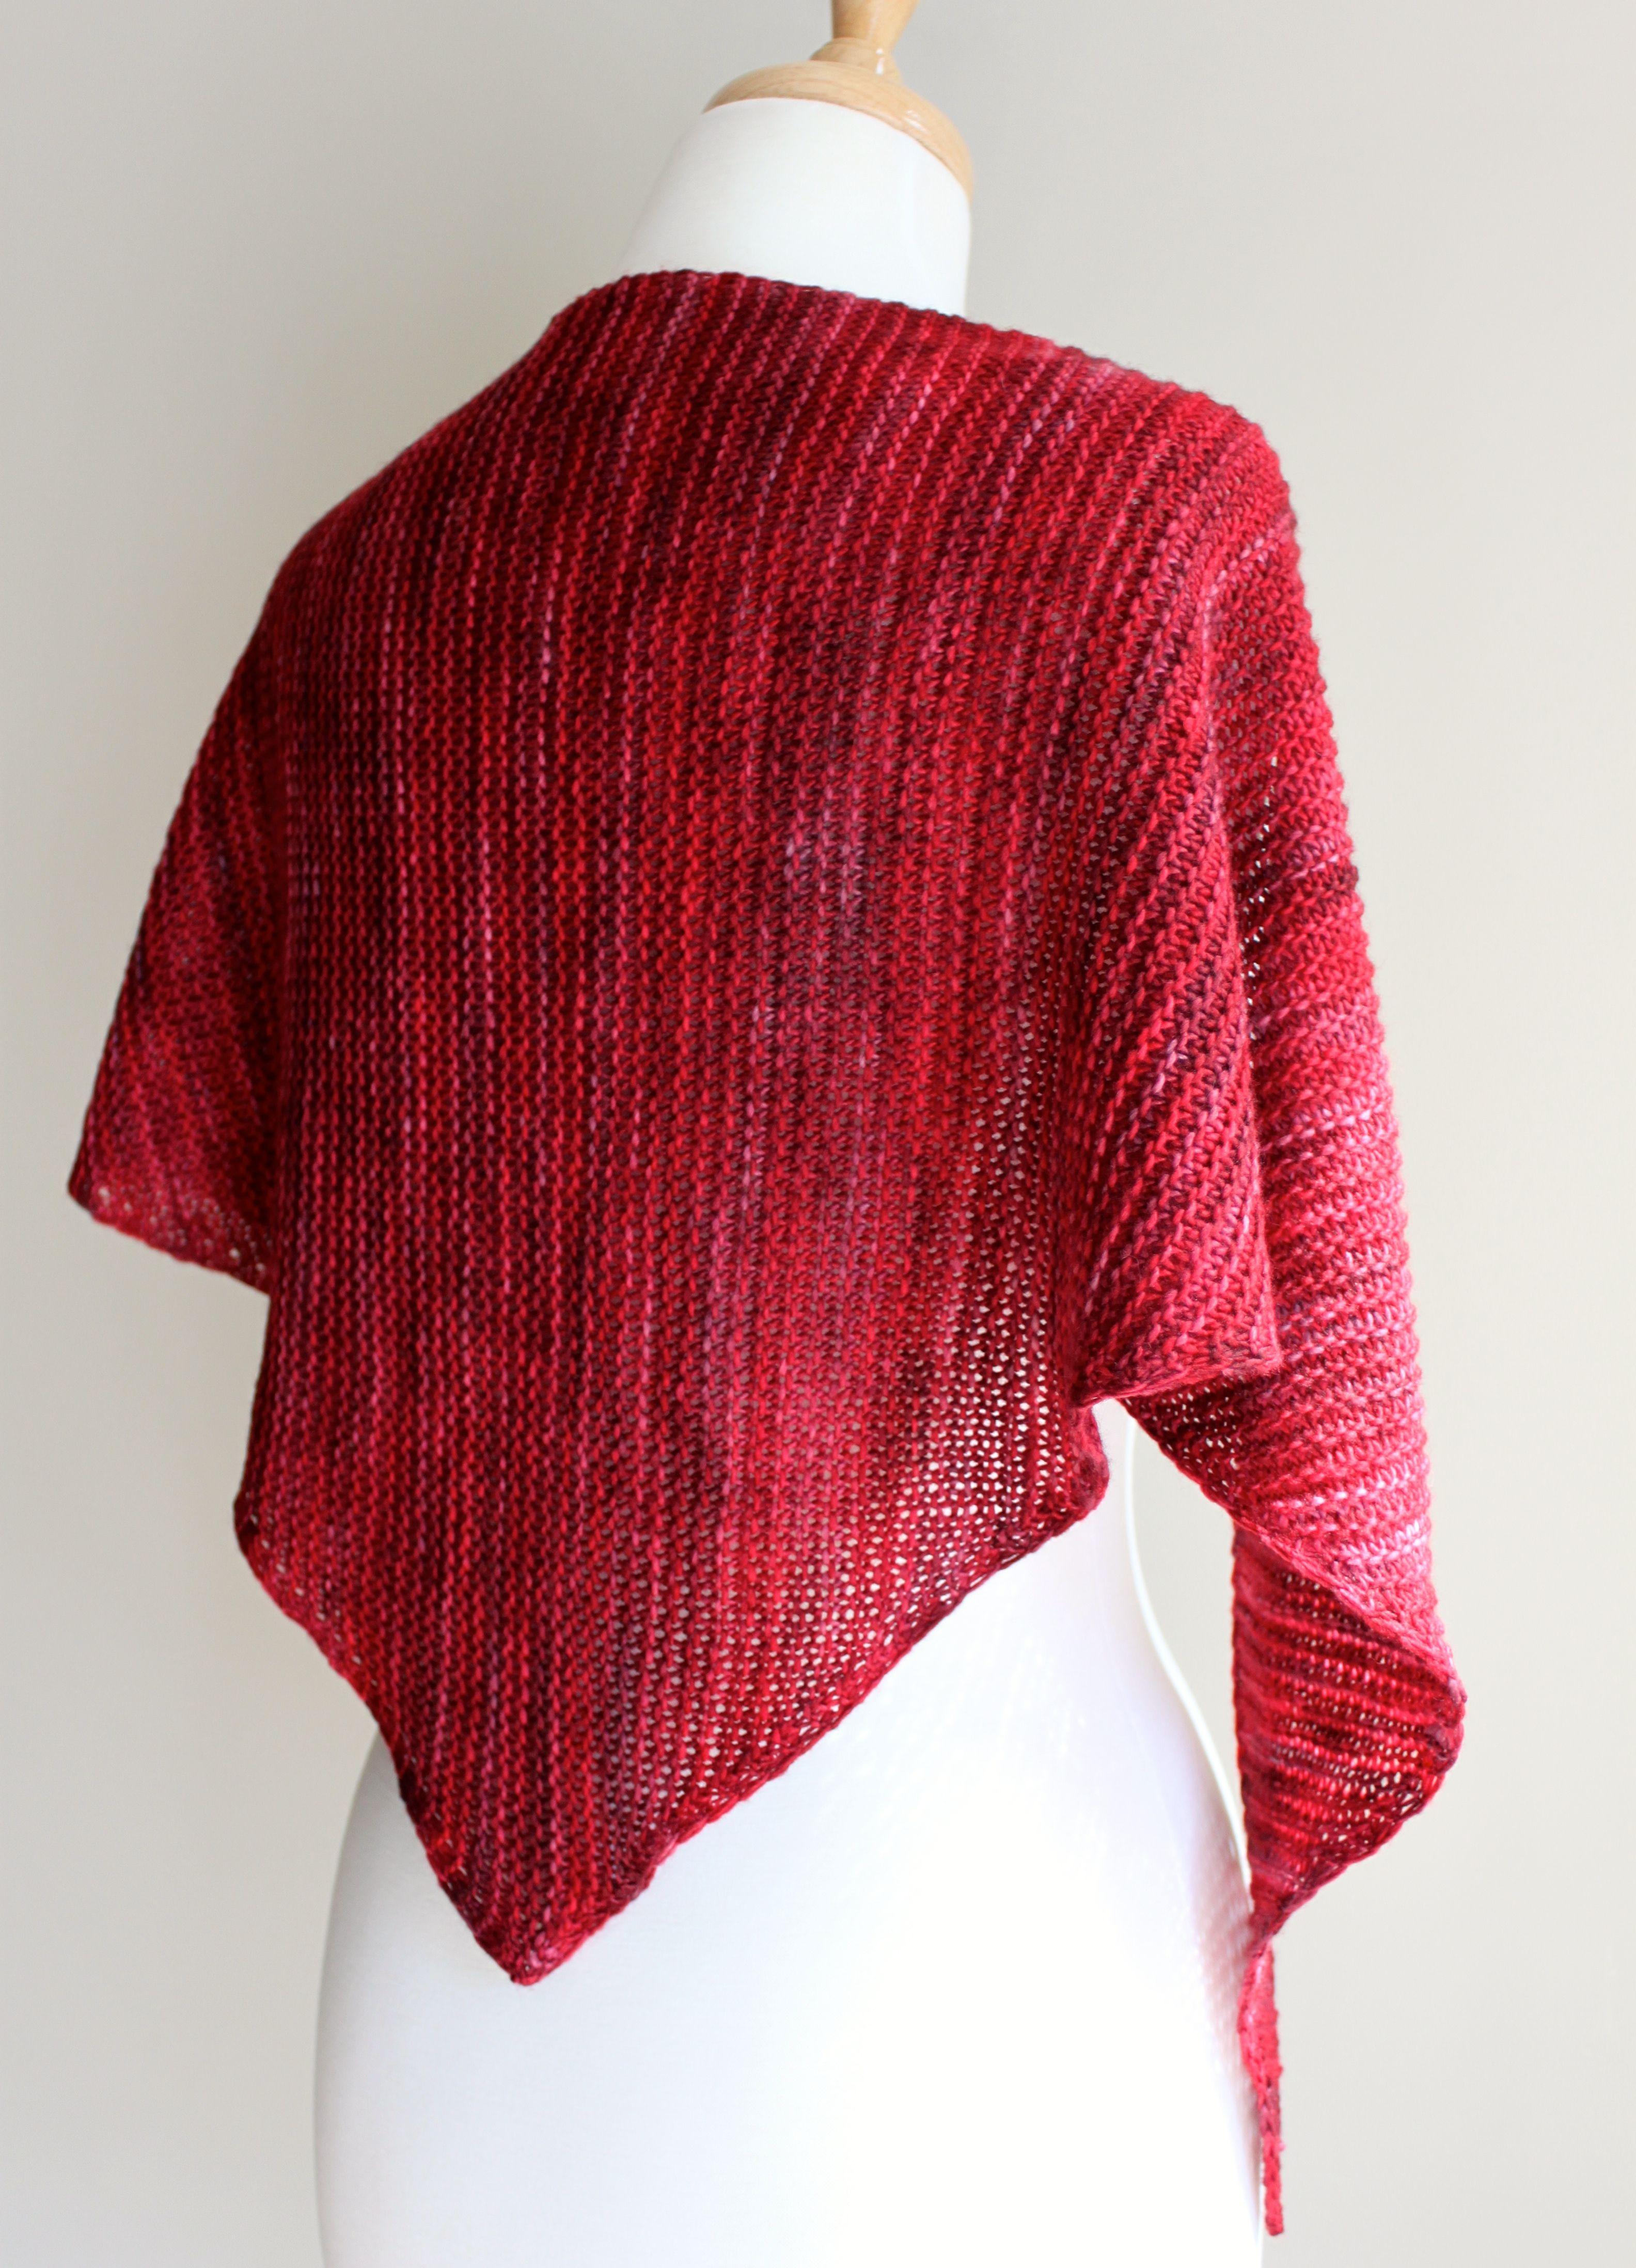 Free knitting patterns truly triangular scarf knitting patterns free knitting patterns truly triangular scarf bankloansurffo Choice Image